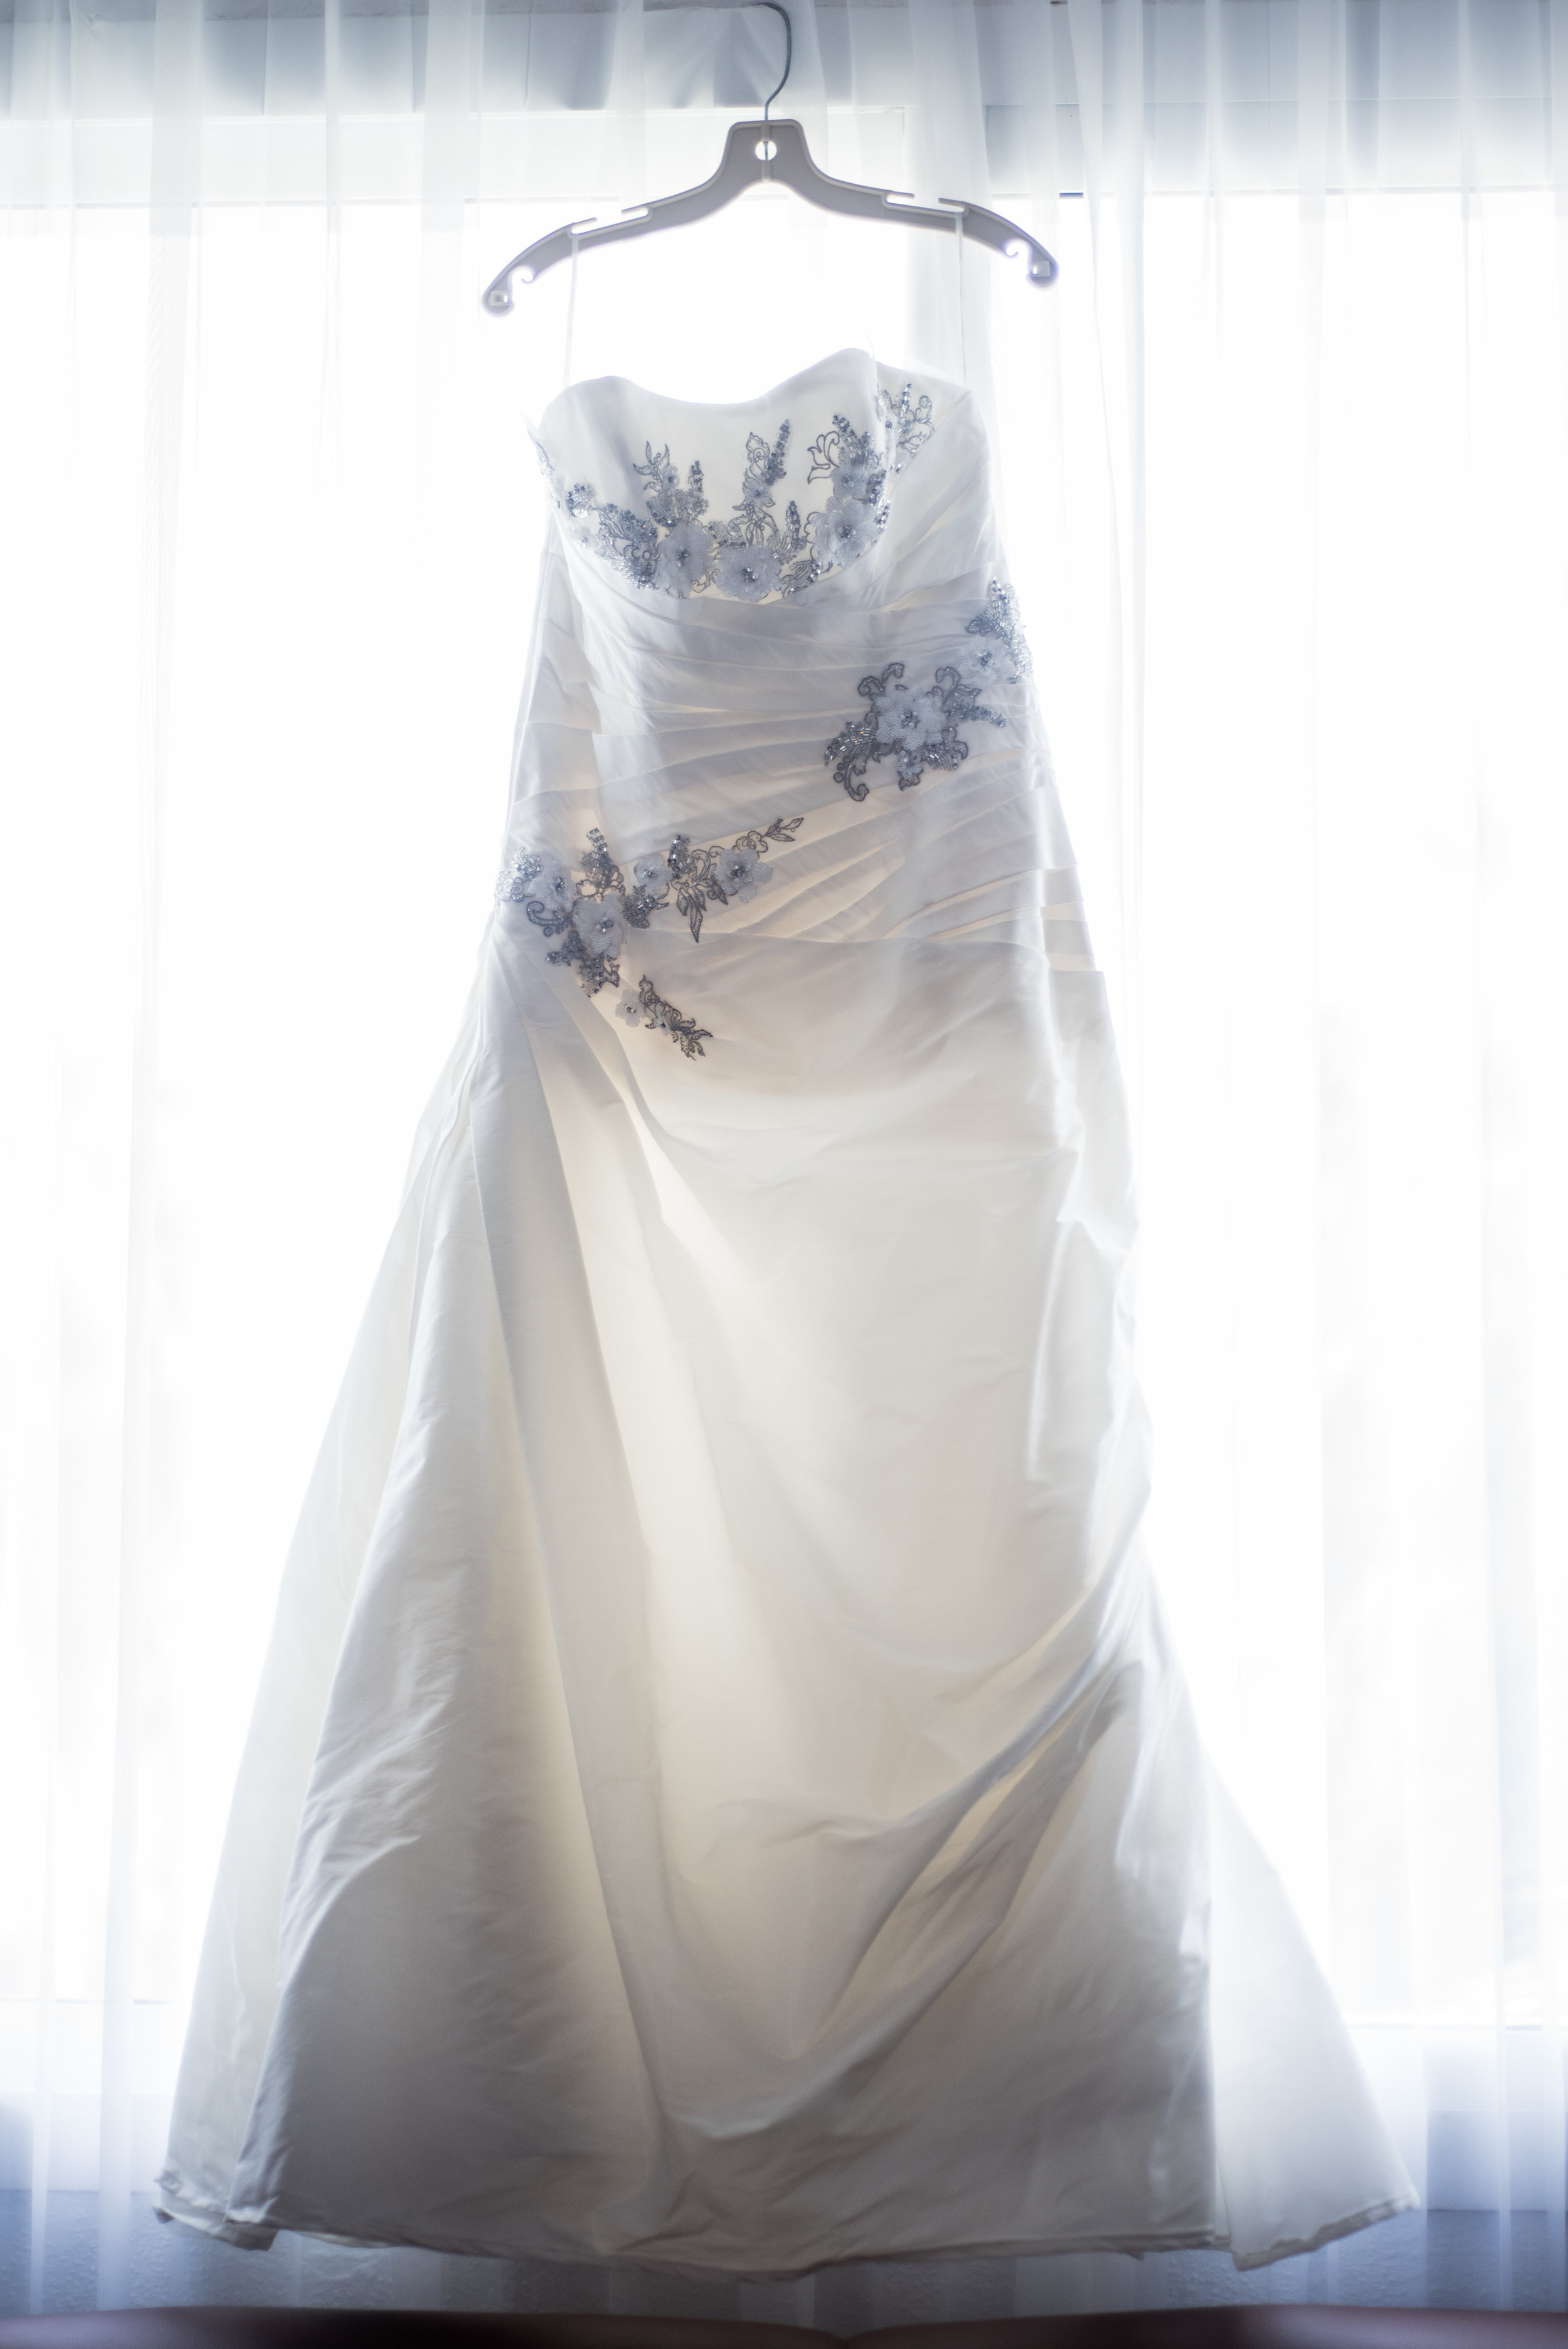 The Dress -